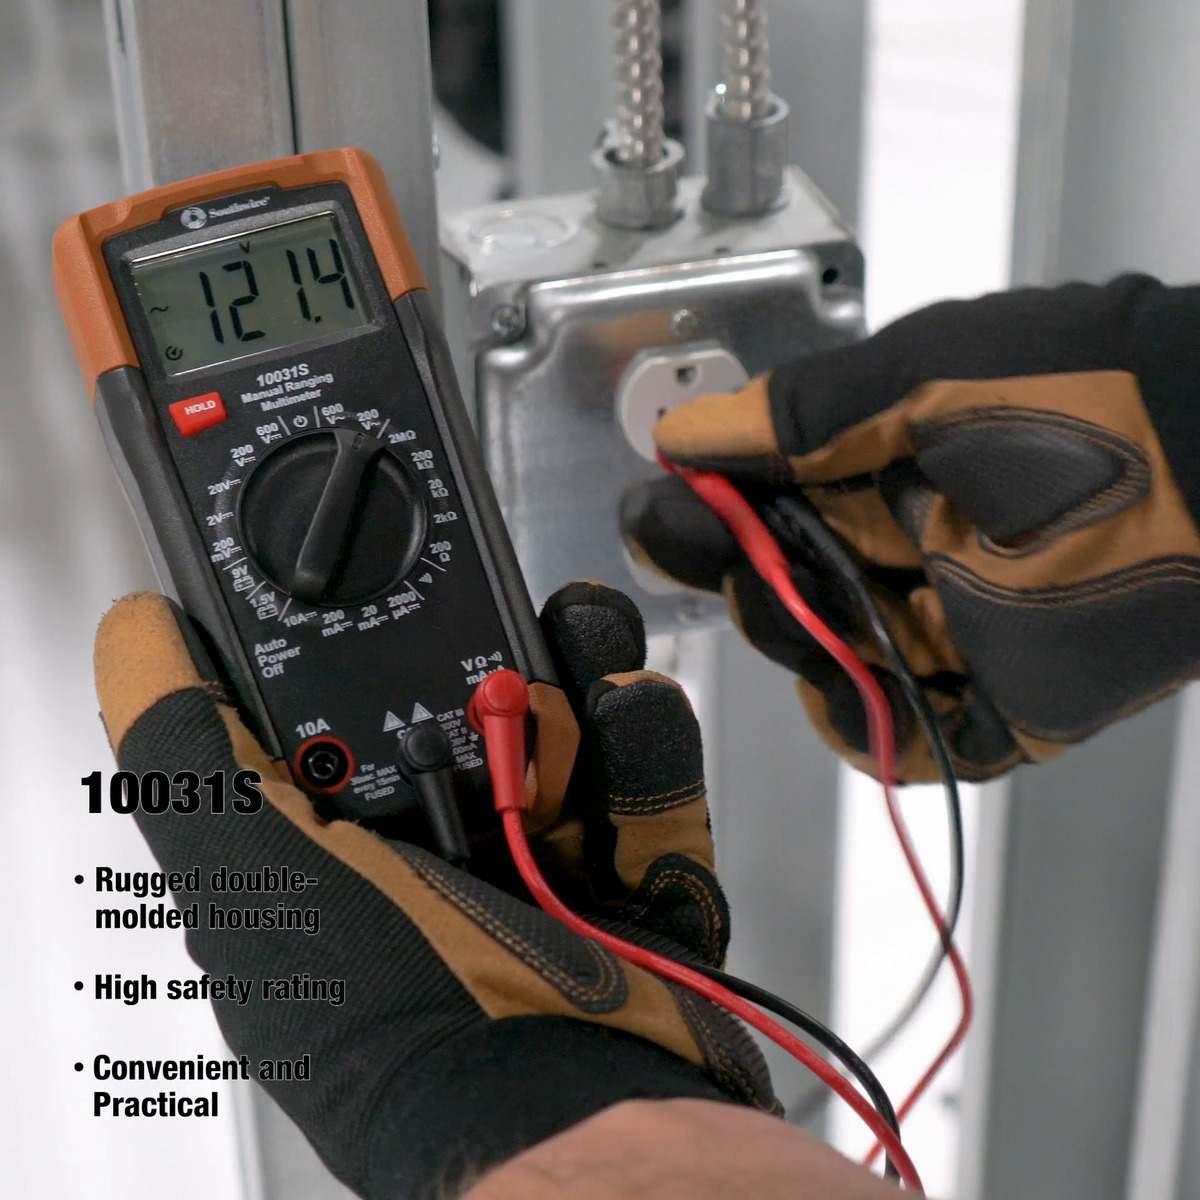 600V 7-Function Manual-Ranging Multimeter